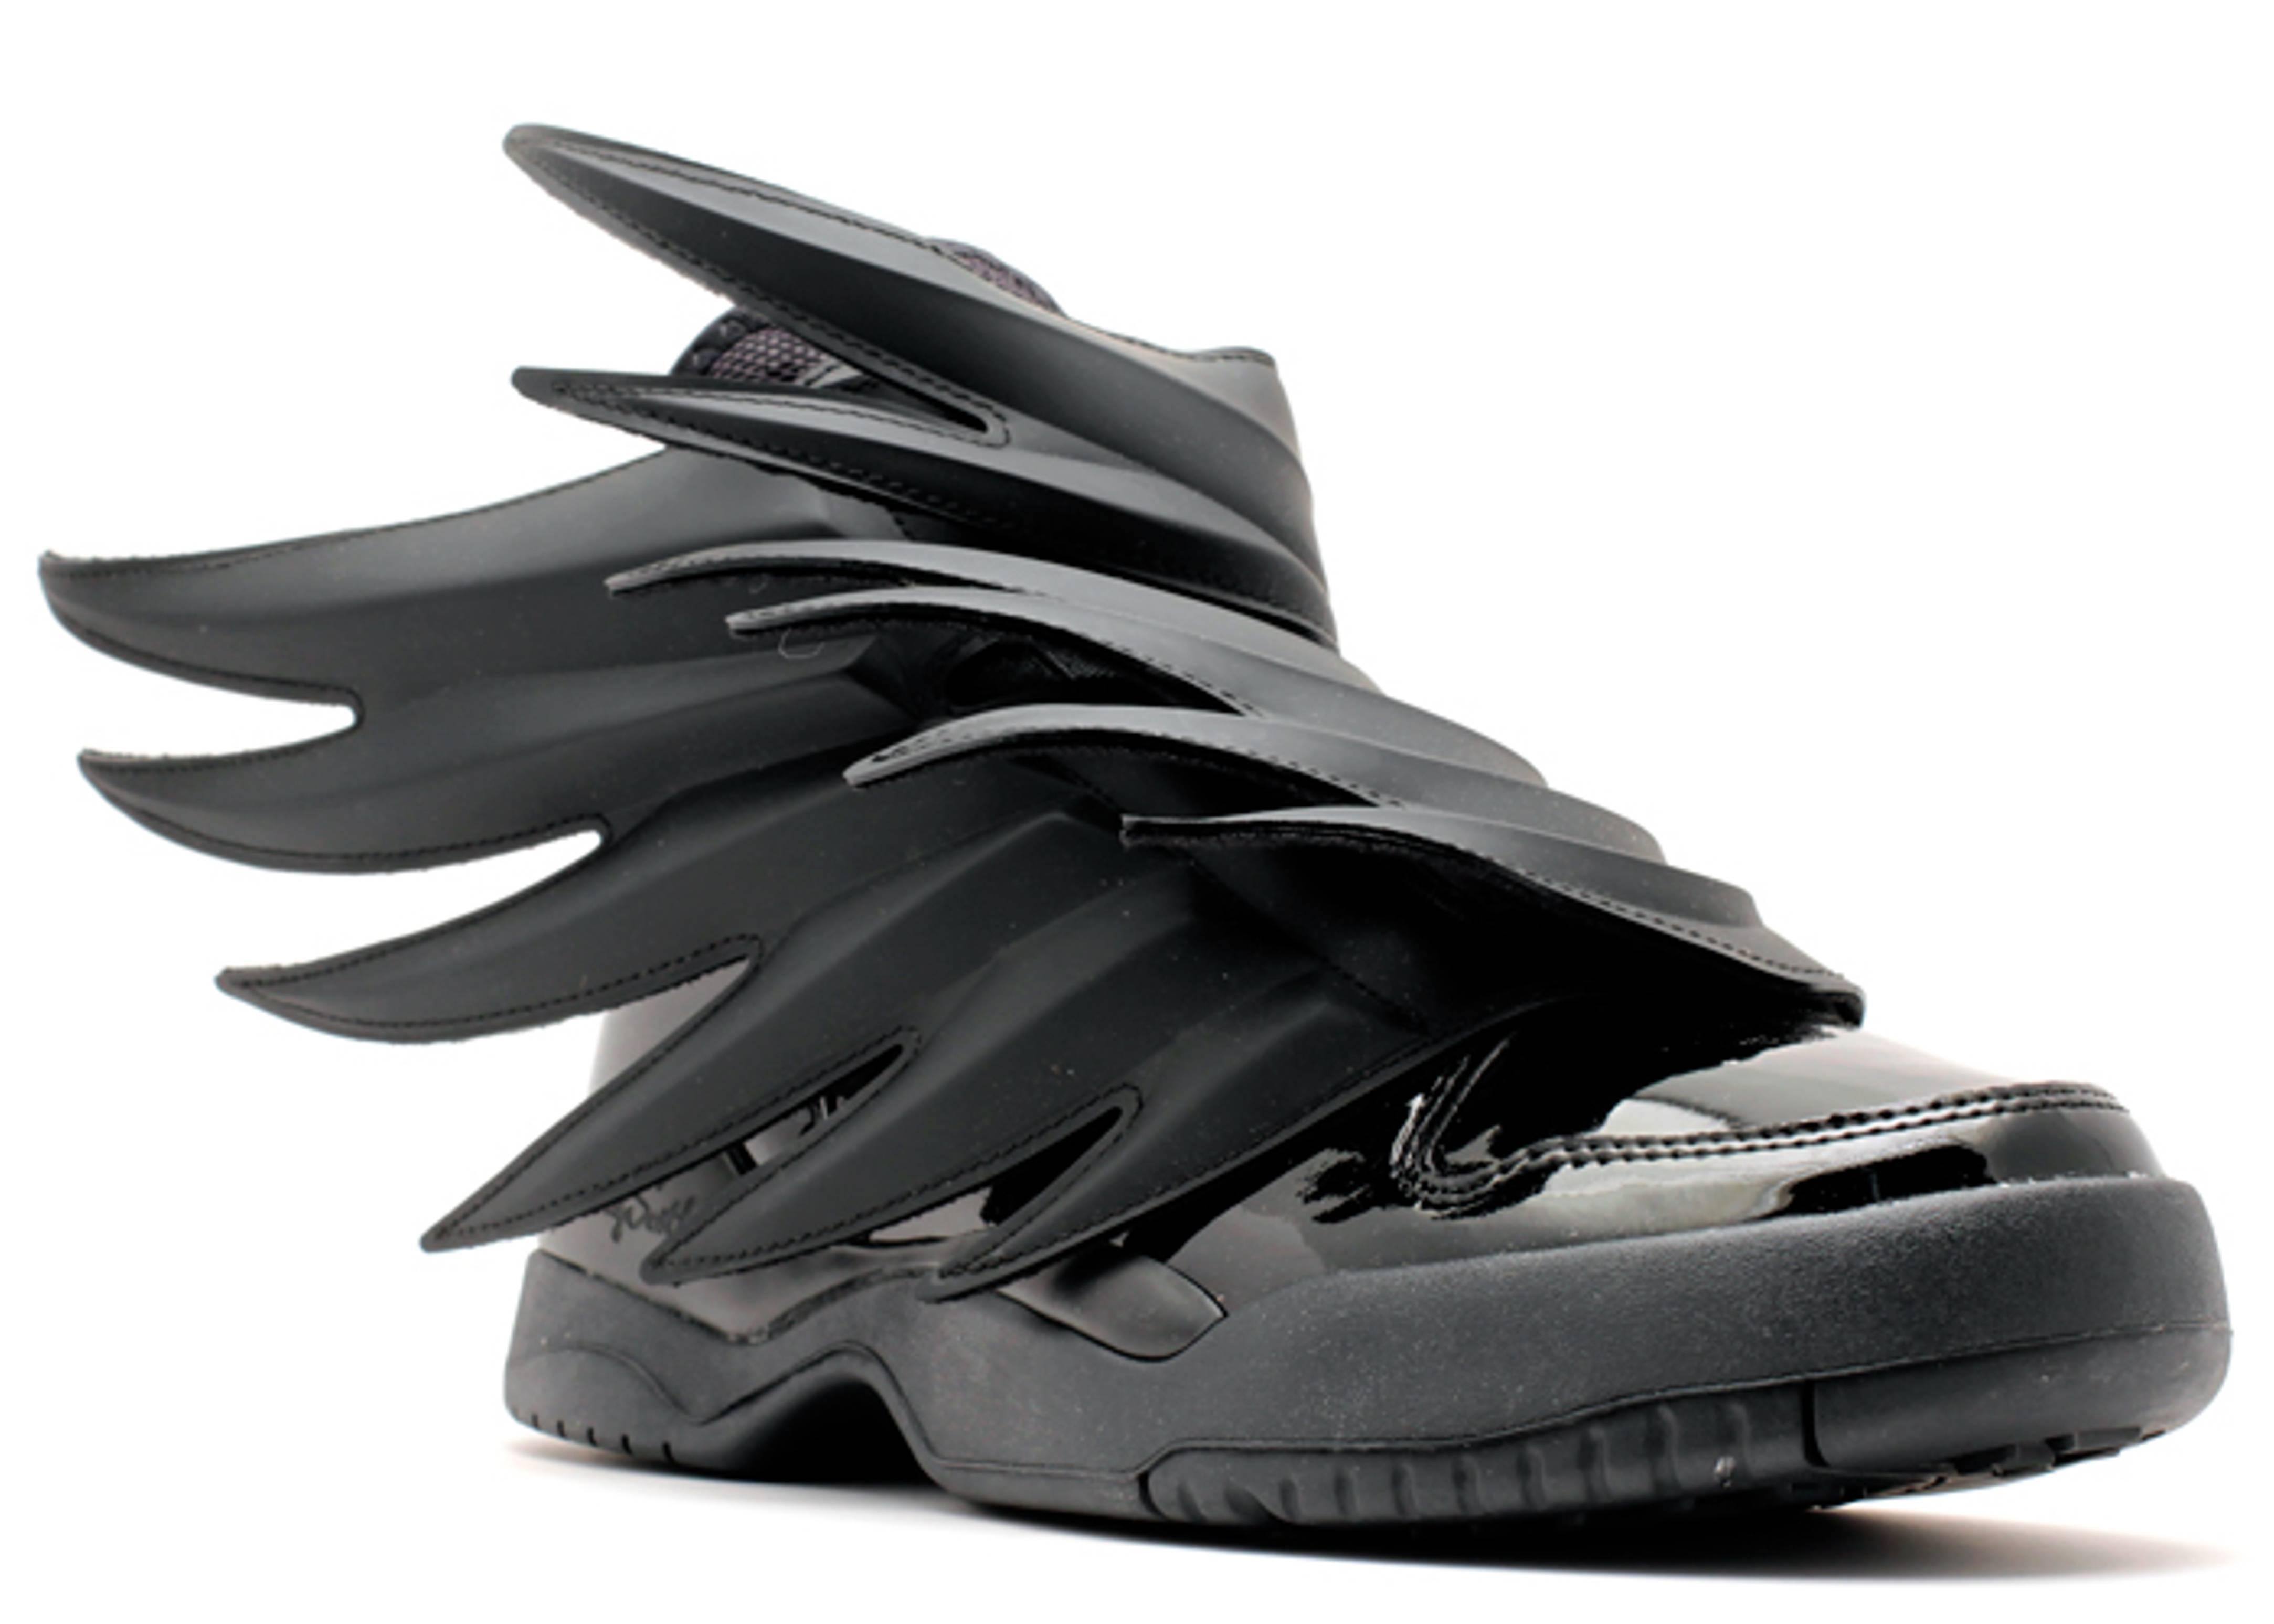 e21b36a1cb3 Buy 2 OFF ANY jeremy scott adidas batman CASE AND GET 70% OFF!